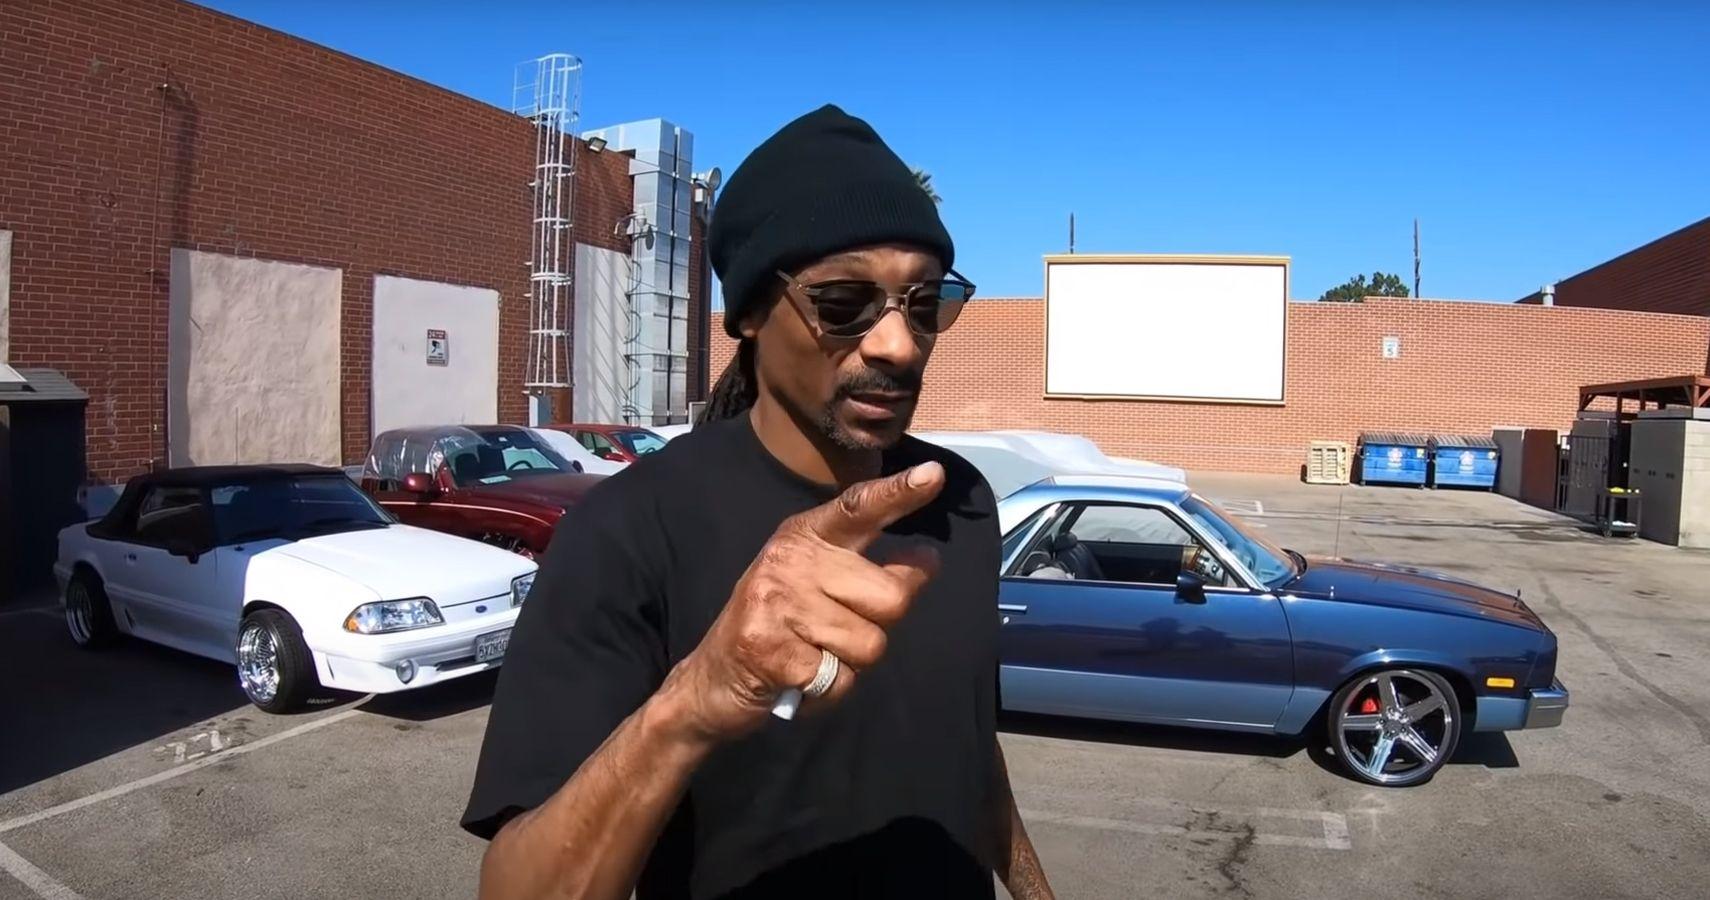 Watch Snoop Dogg Splurge On A Restored El Camino | HotCars